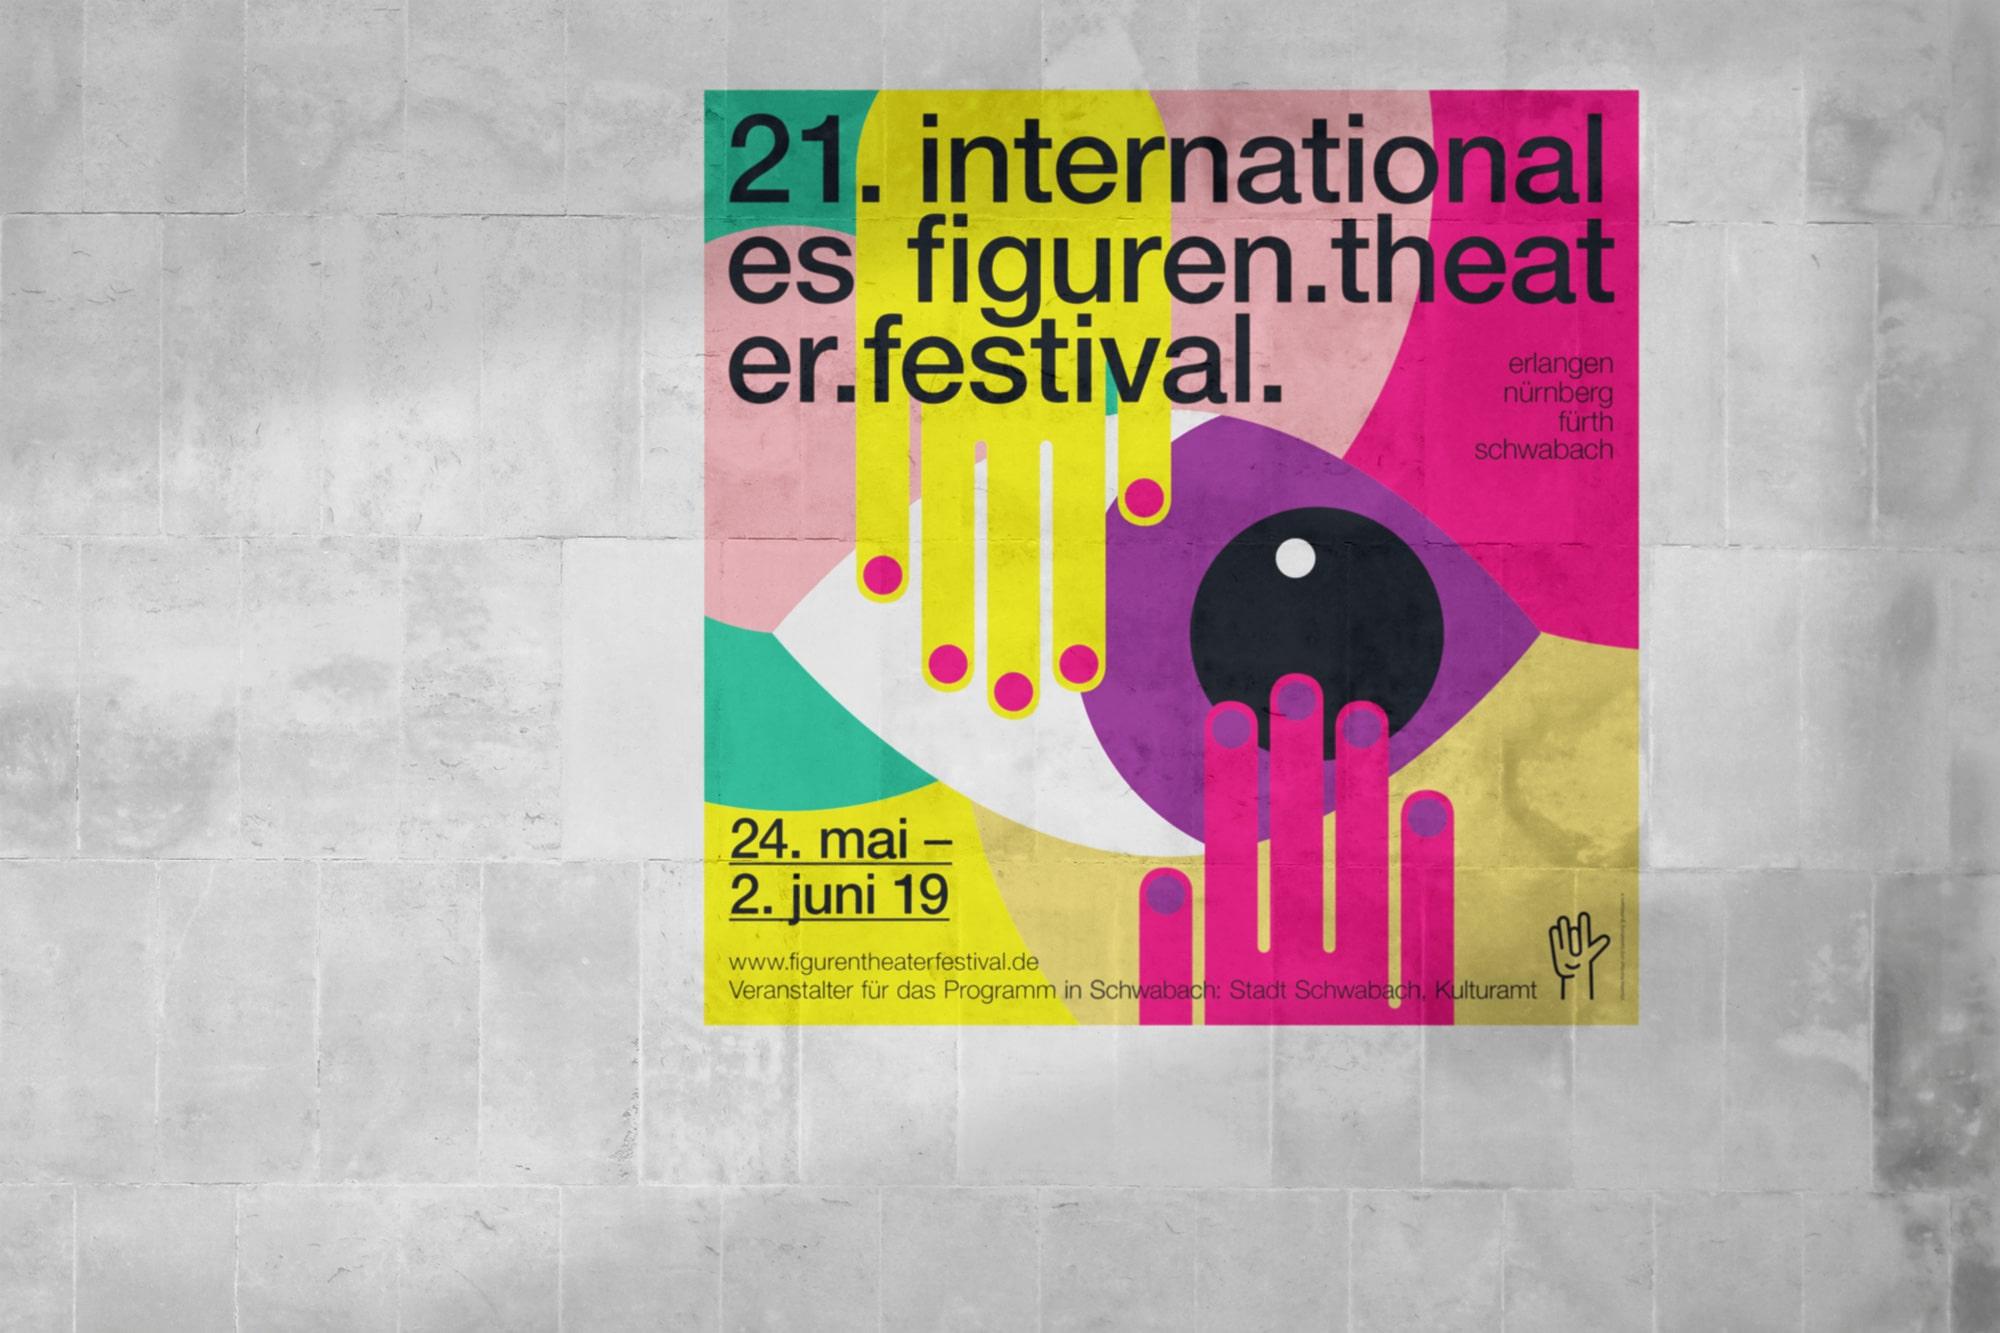 planx-internationales.figuren.theater.festival-Wall